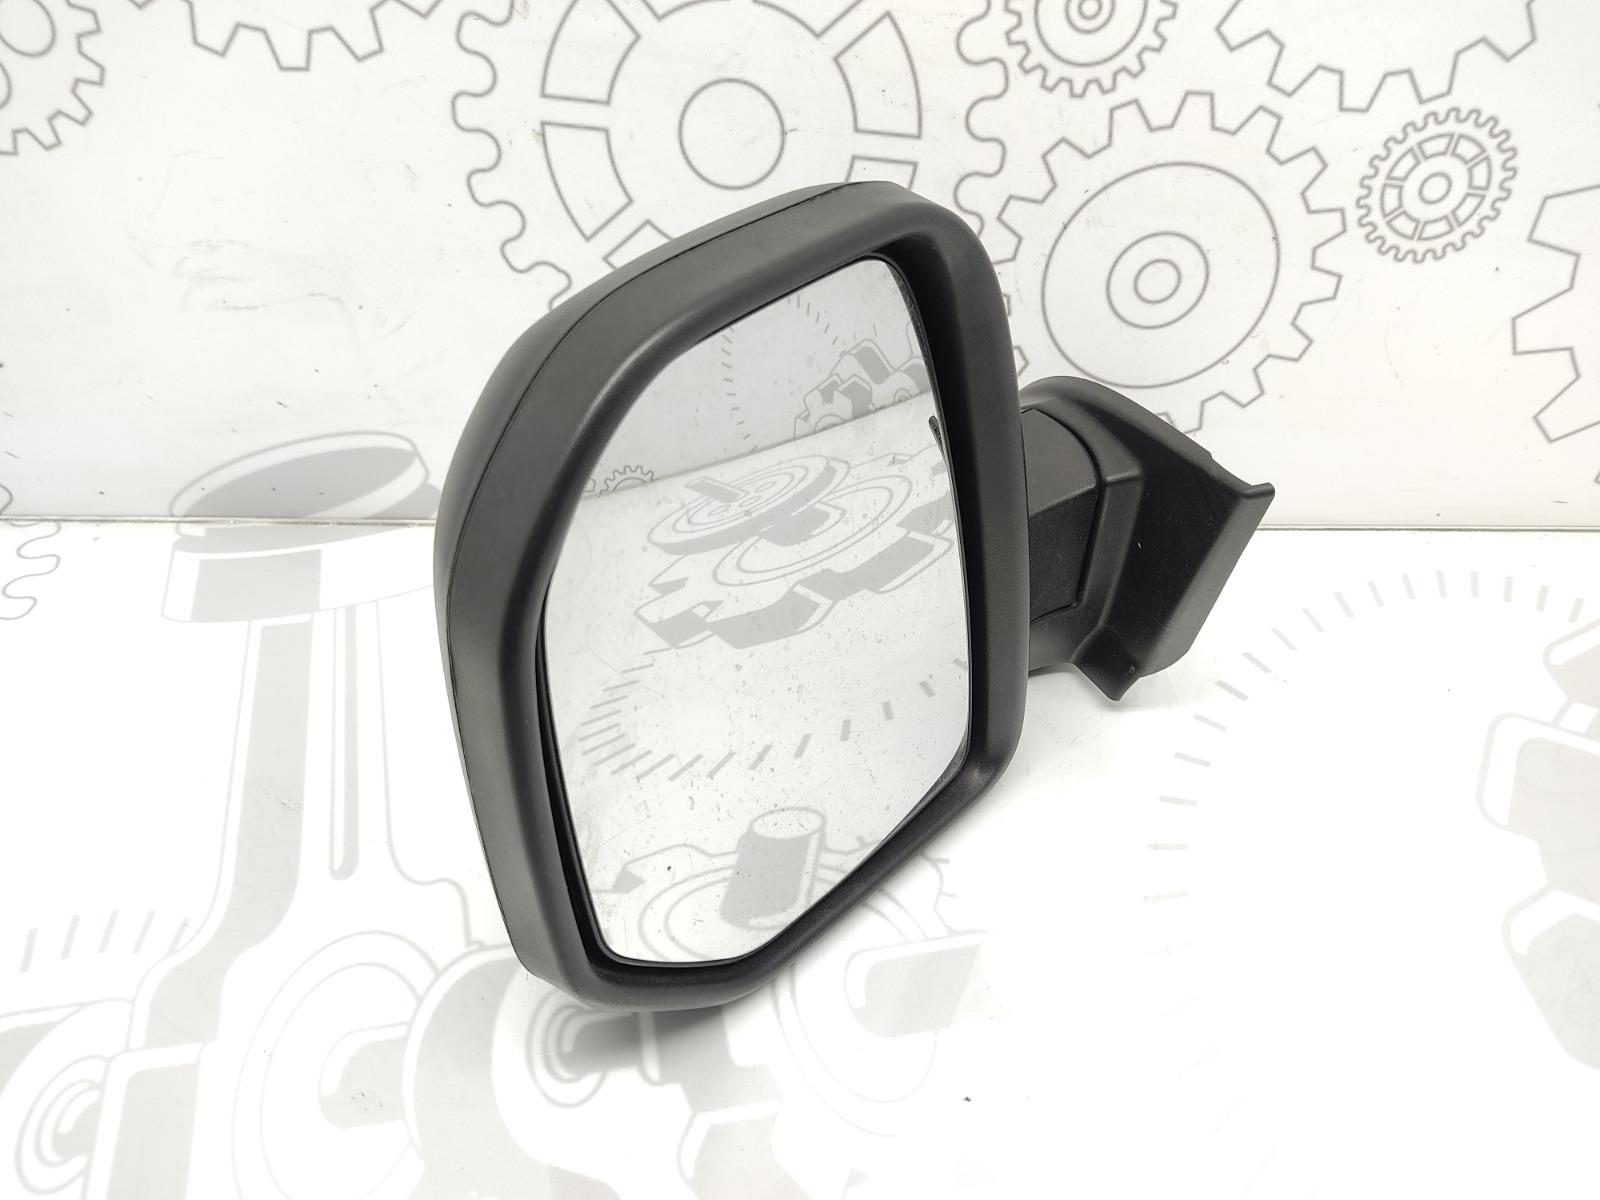 Зеркало наружное левое Peugeot Partner 1.6 HDI 2008 (б/у)